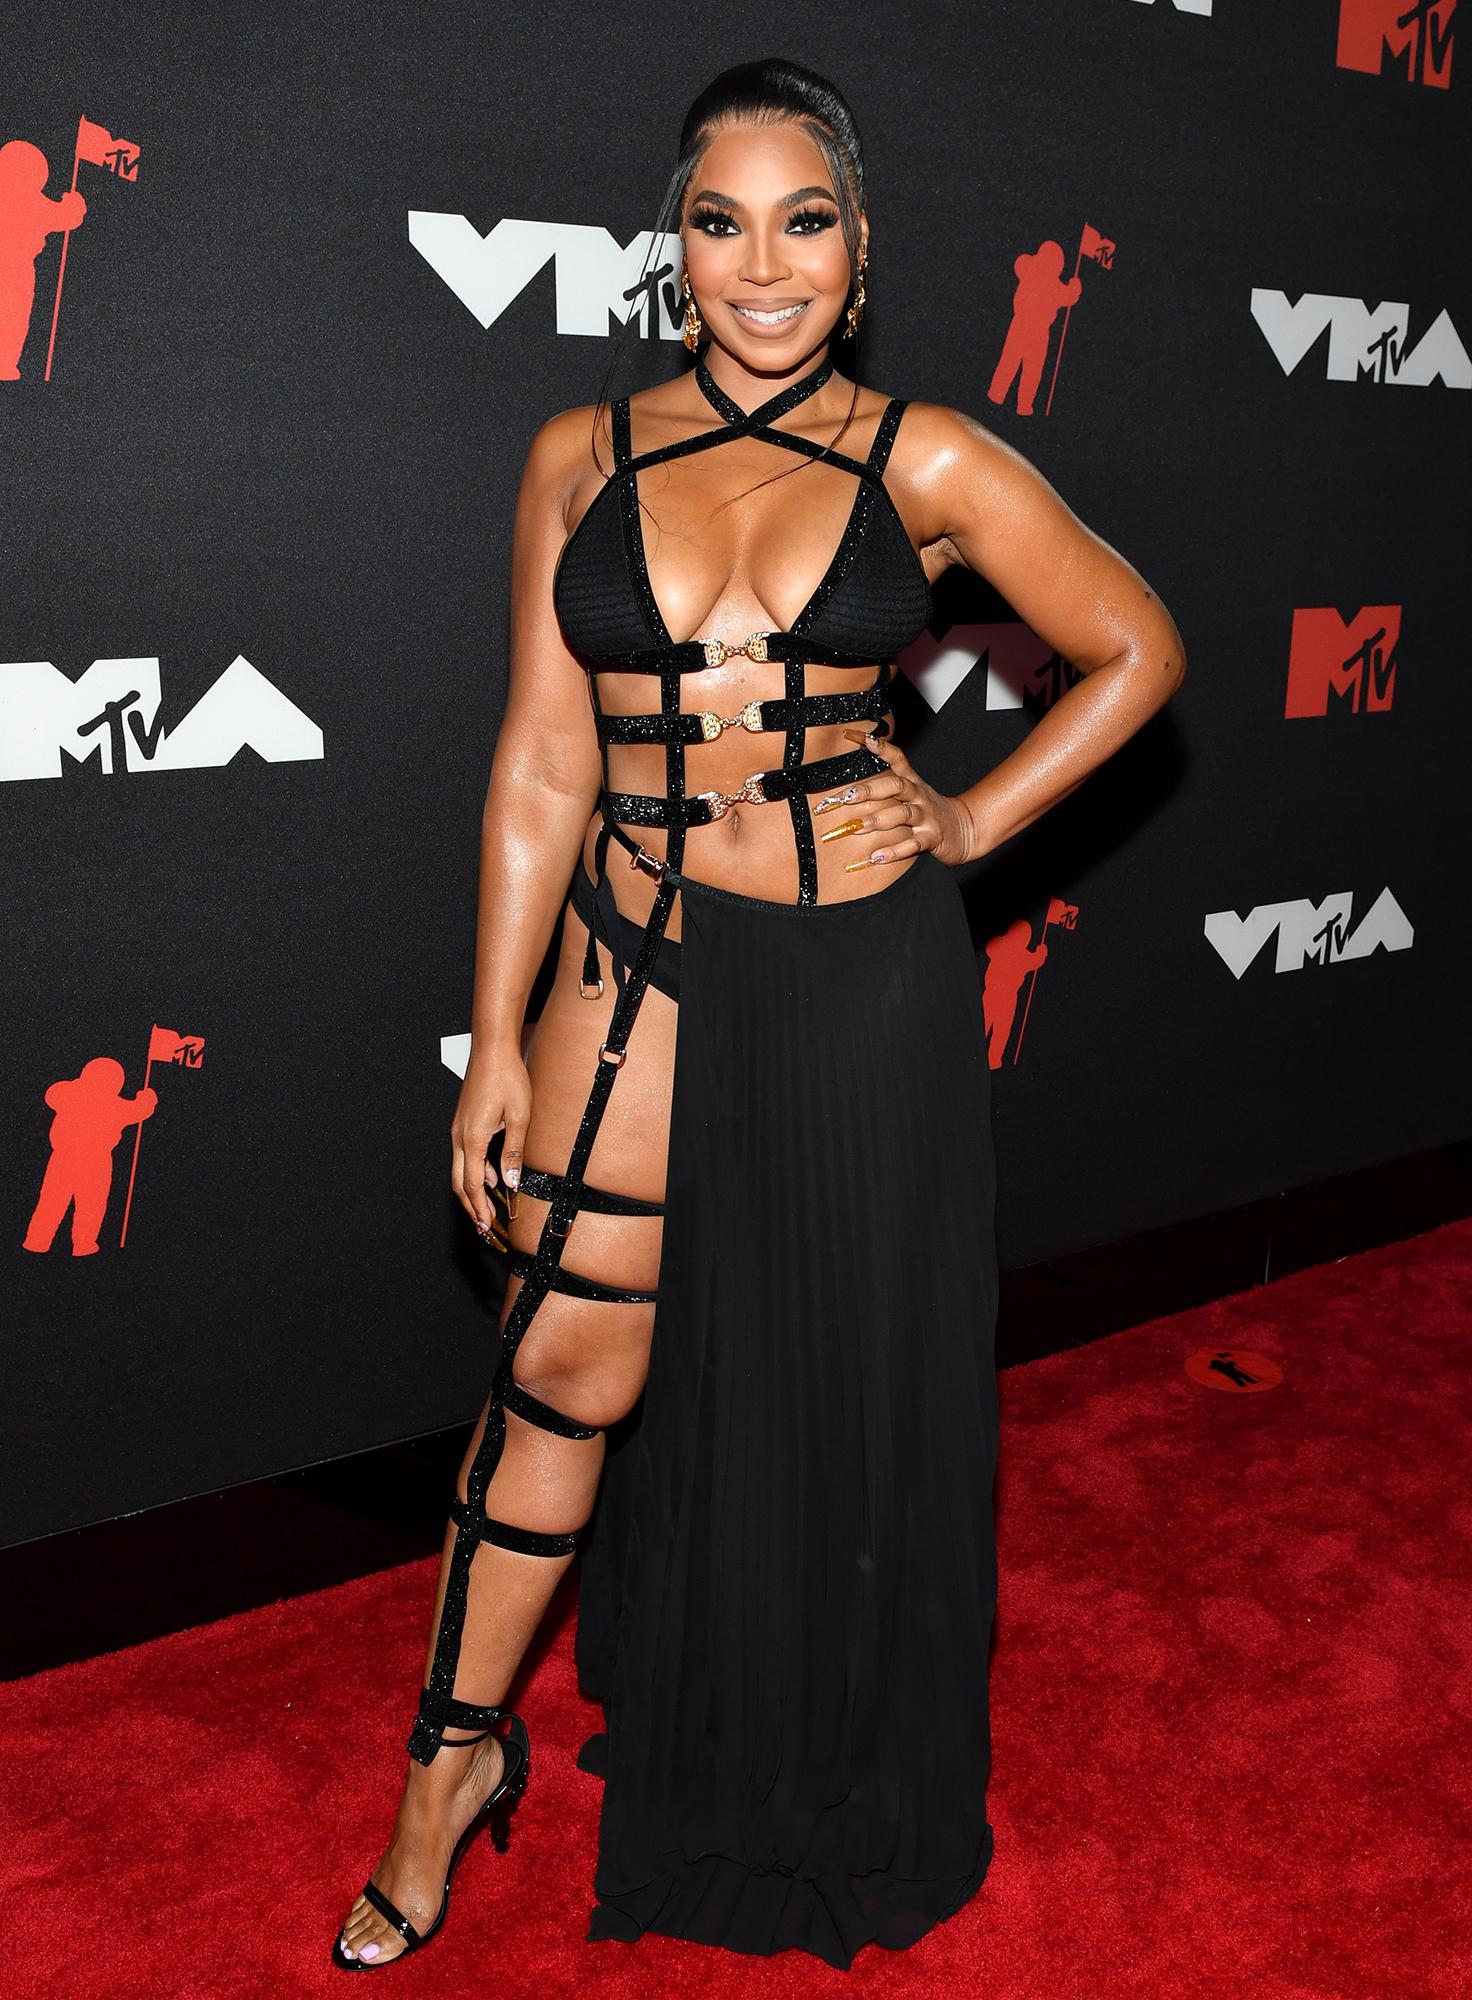 Ashanti arrives at the 2021 MTV Video Music Awards